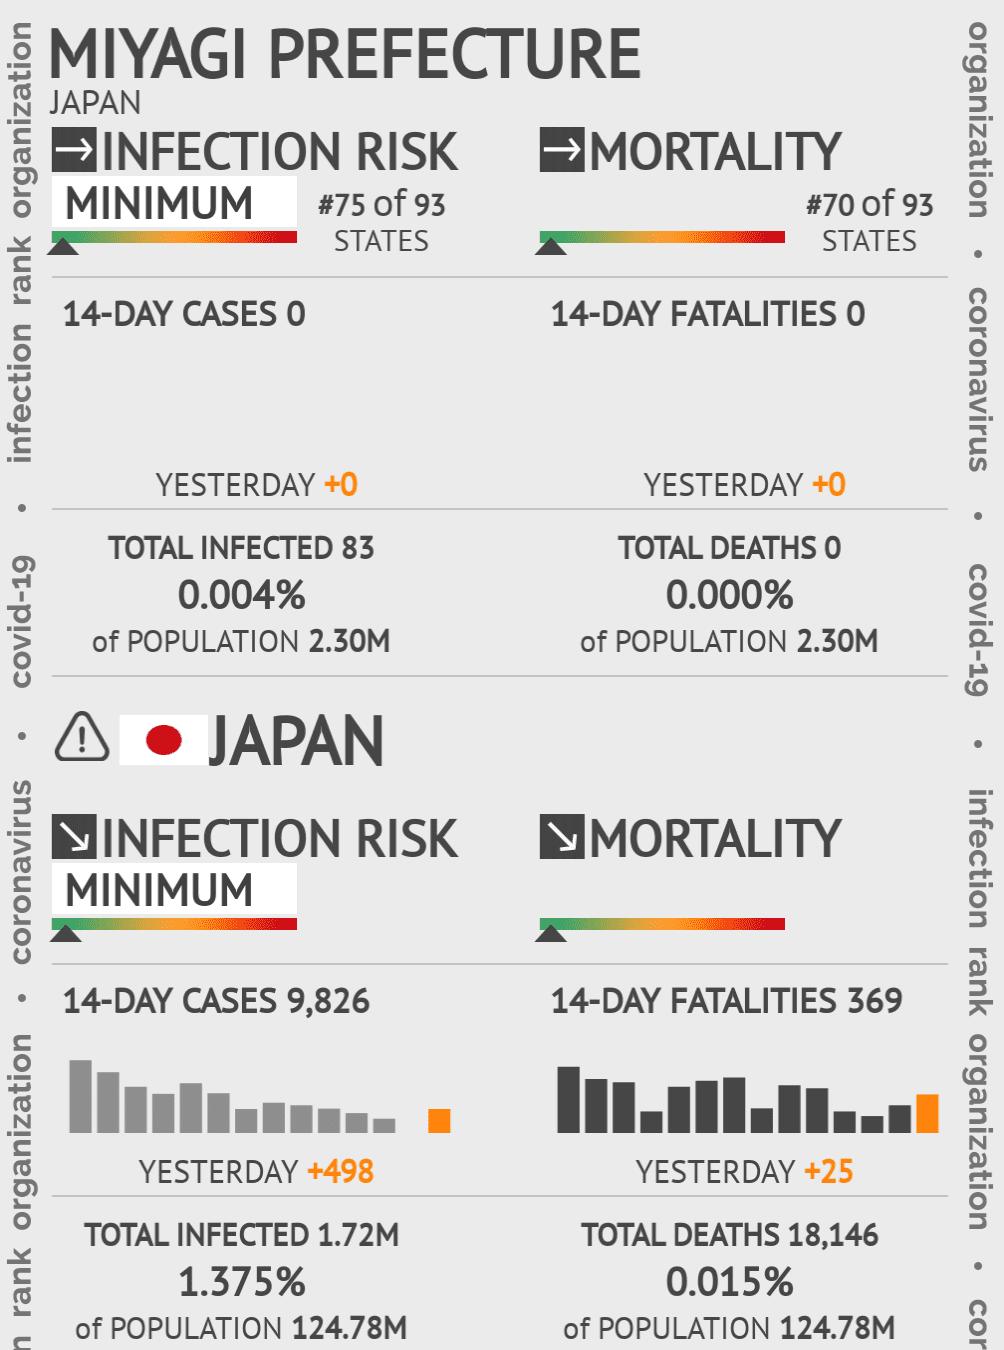 Miyagi Prefecture Coronavirus Covid-19 Risk of Infection on May 14, 2020